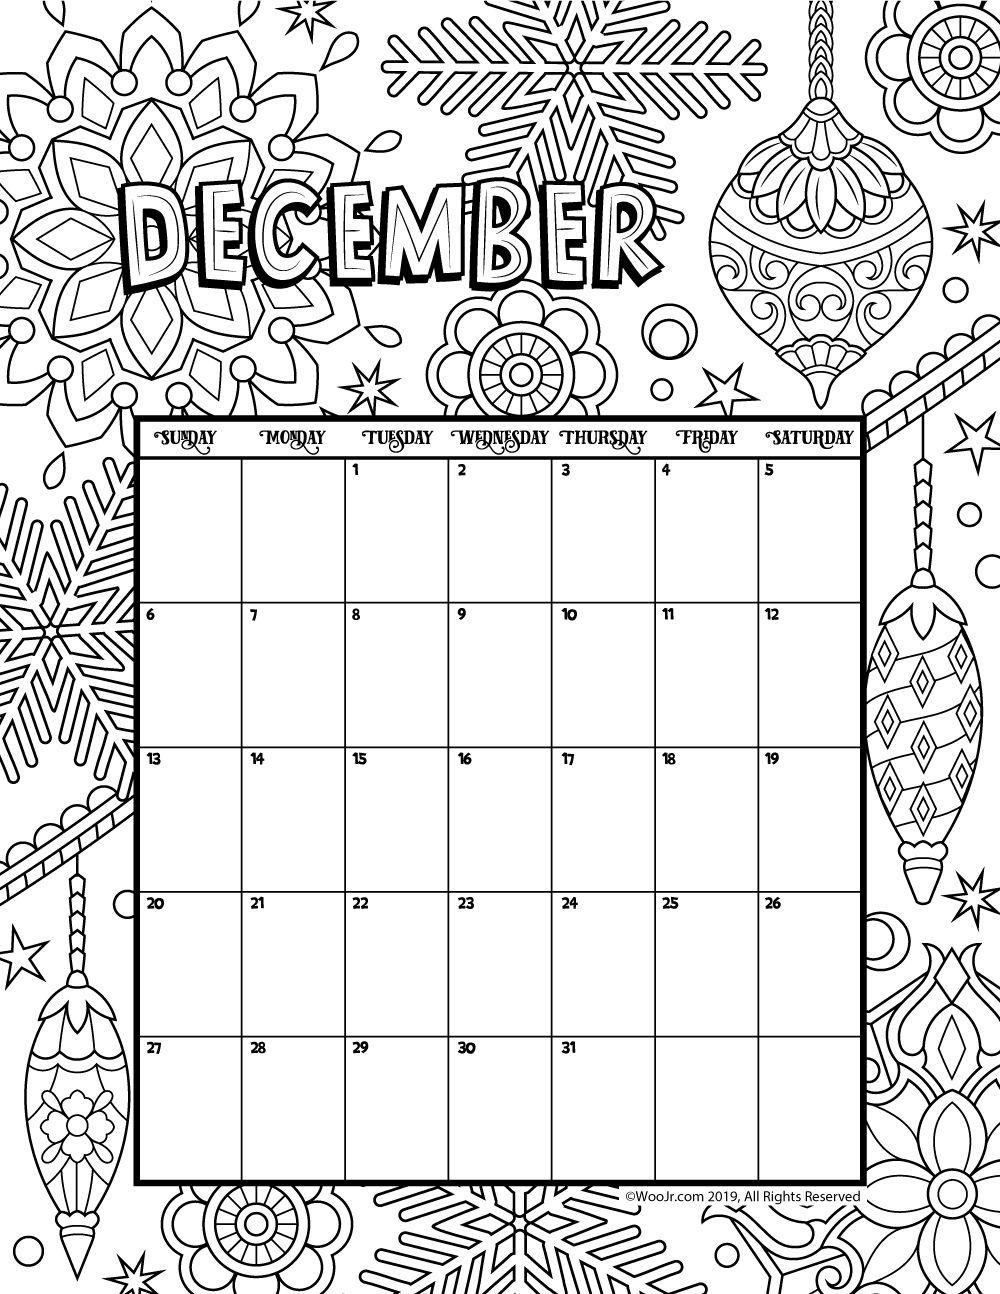 December 2020 Coloring Calendar Kids calendar, New year